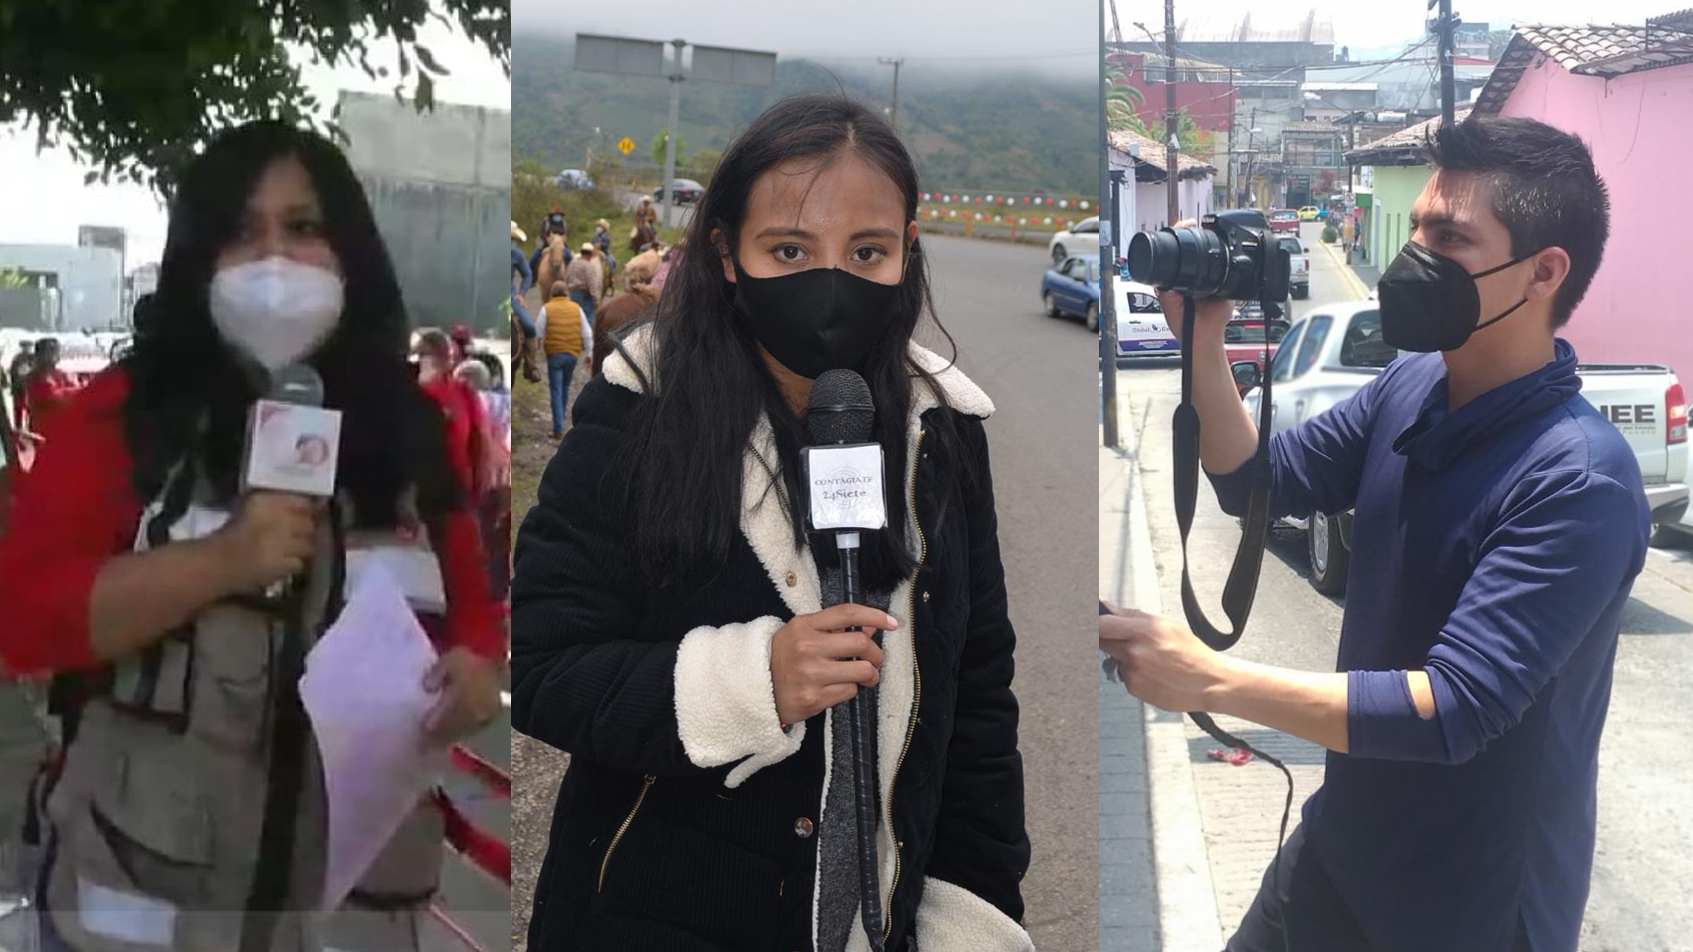 Familia agrede a reporteros al cubrir escena de un crimen en Huauchinango